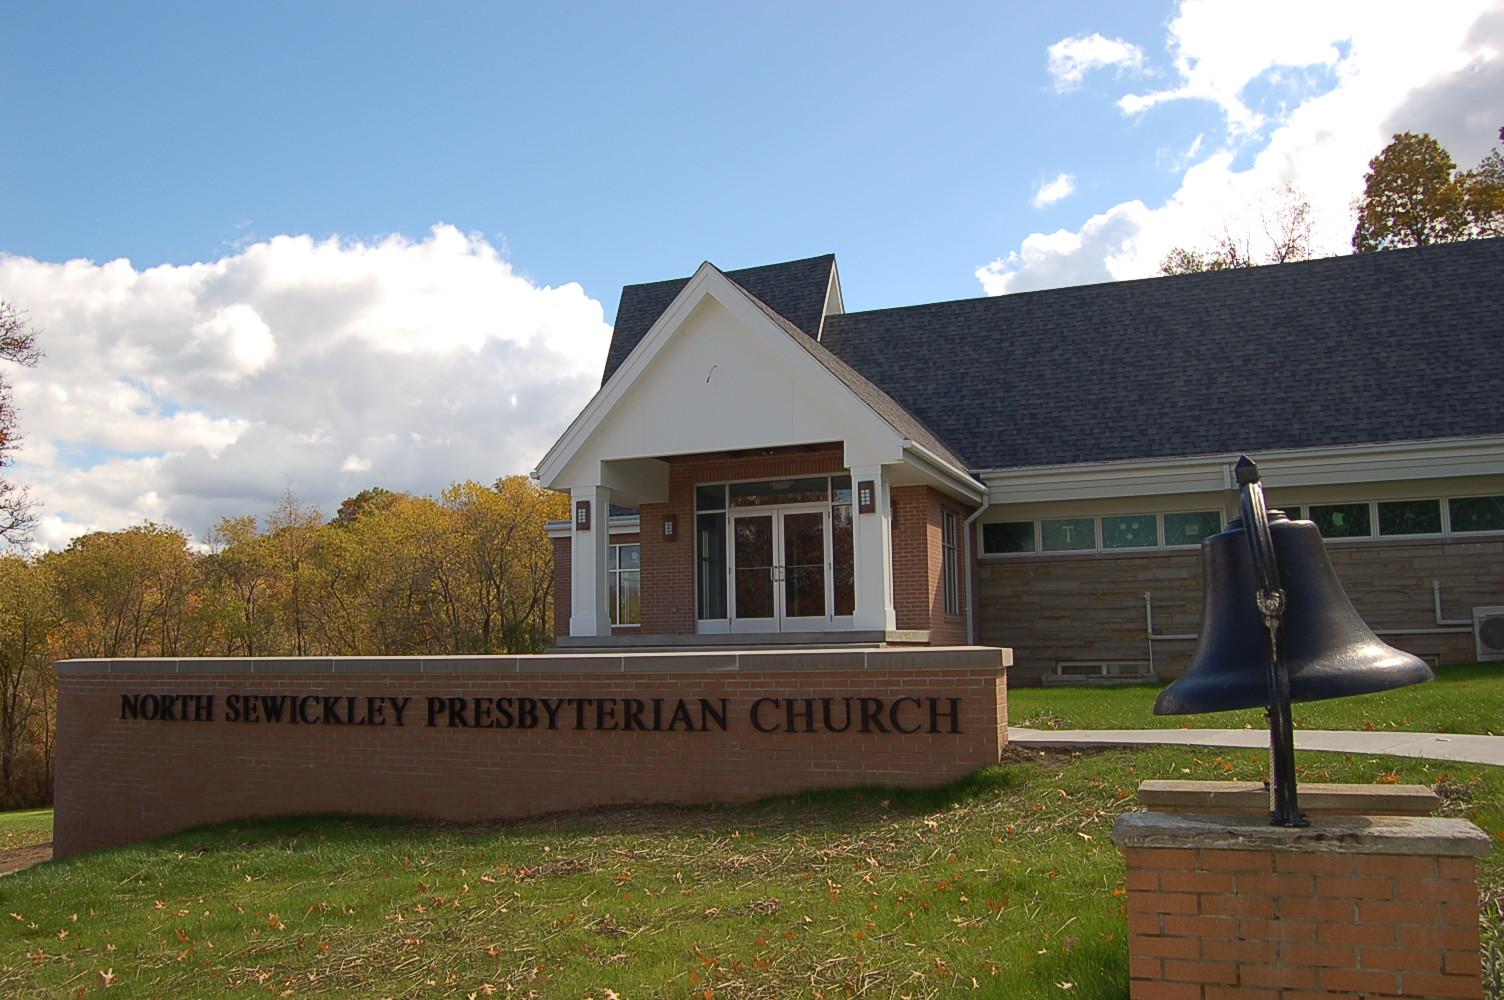 Exterior of North Sewickley Presbyterian Church